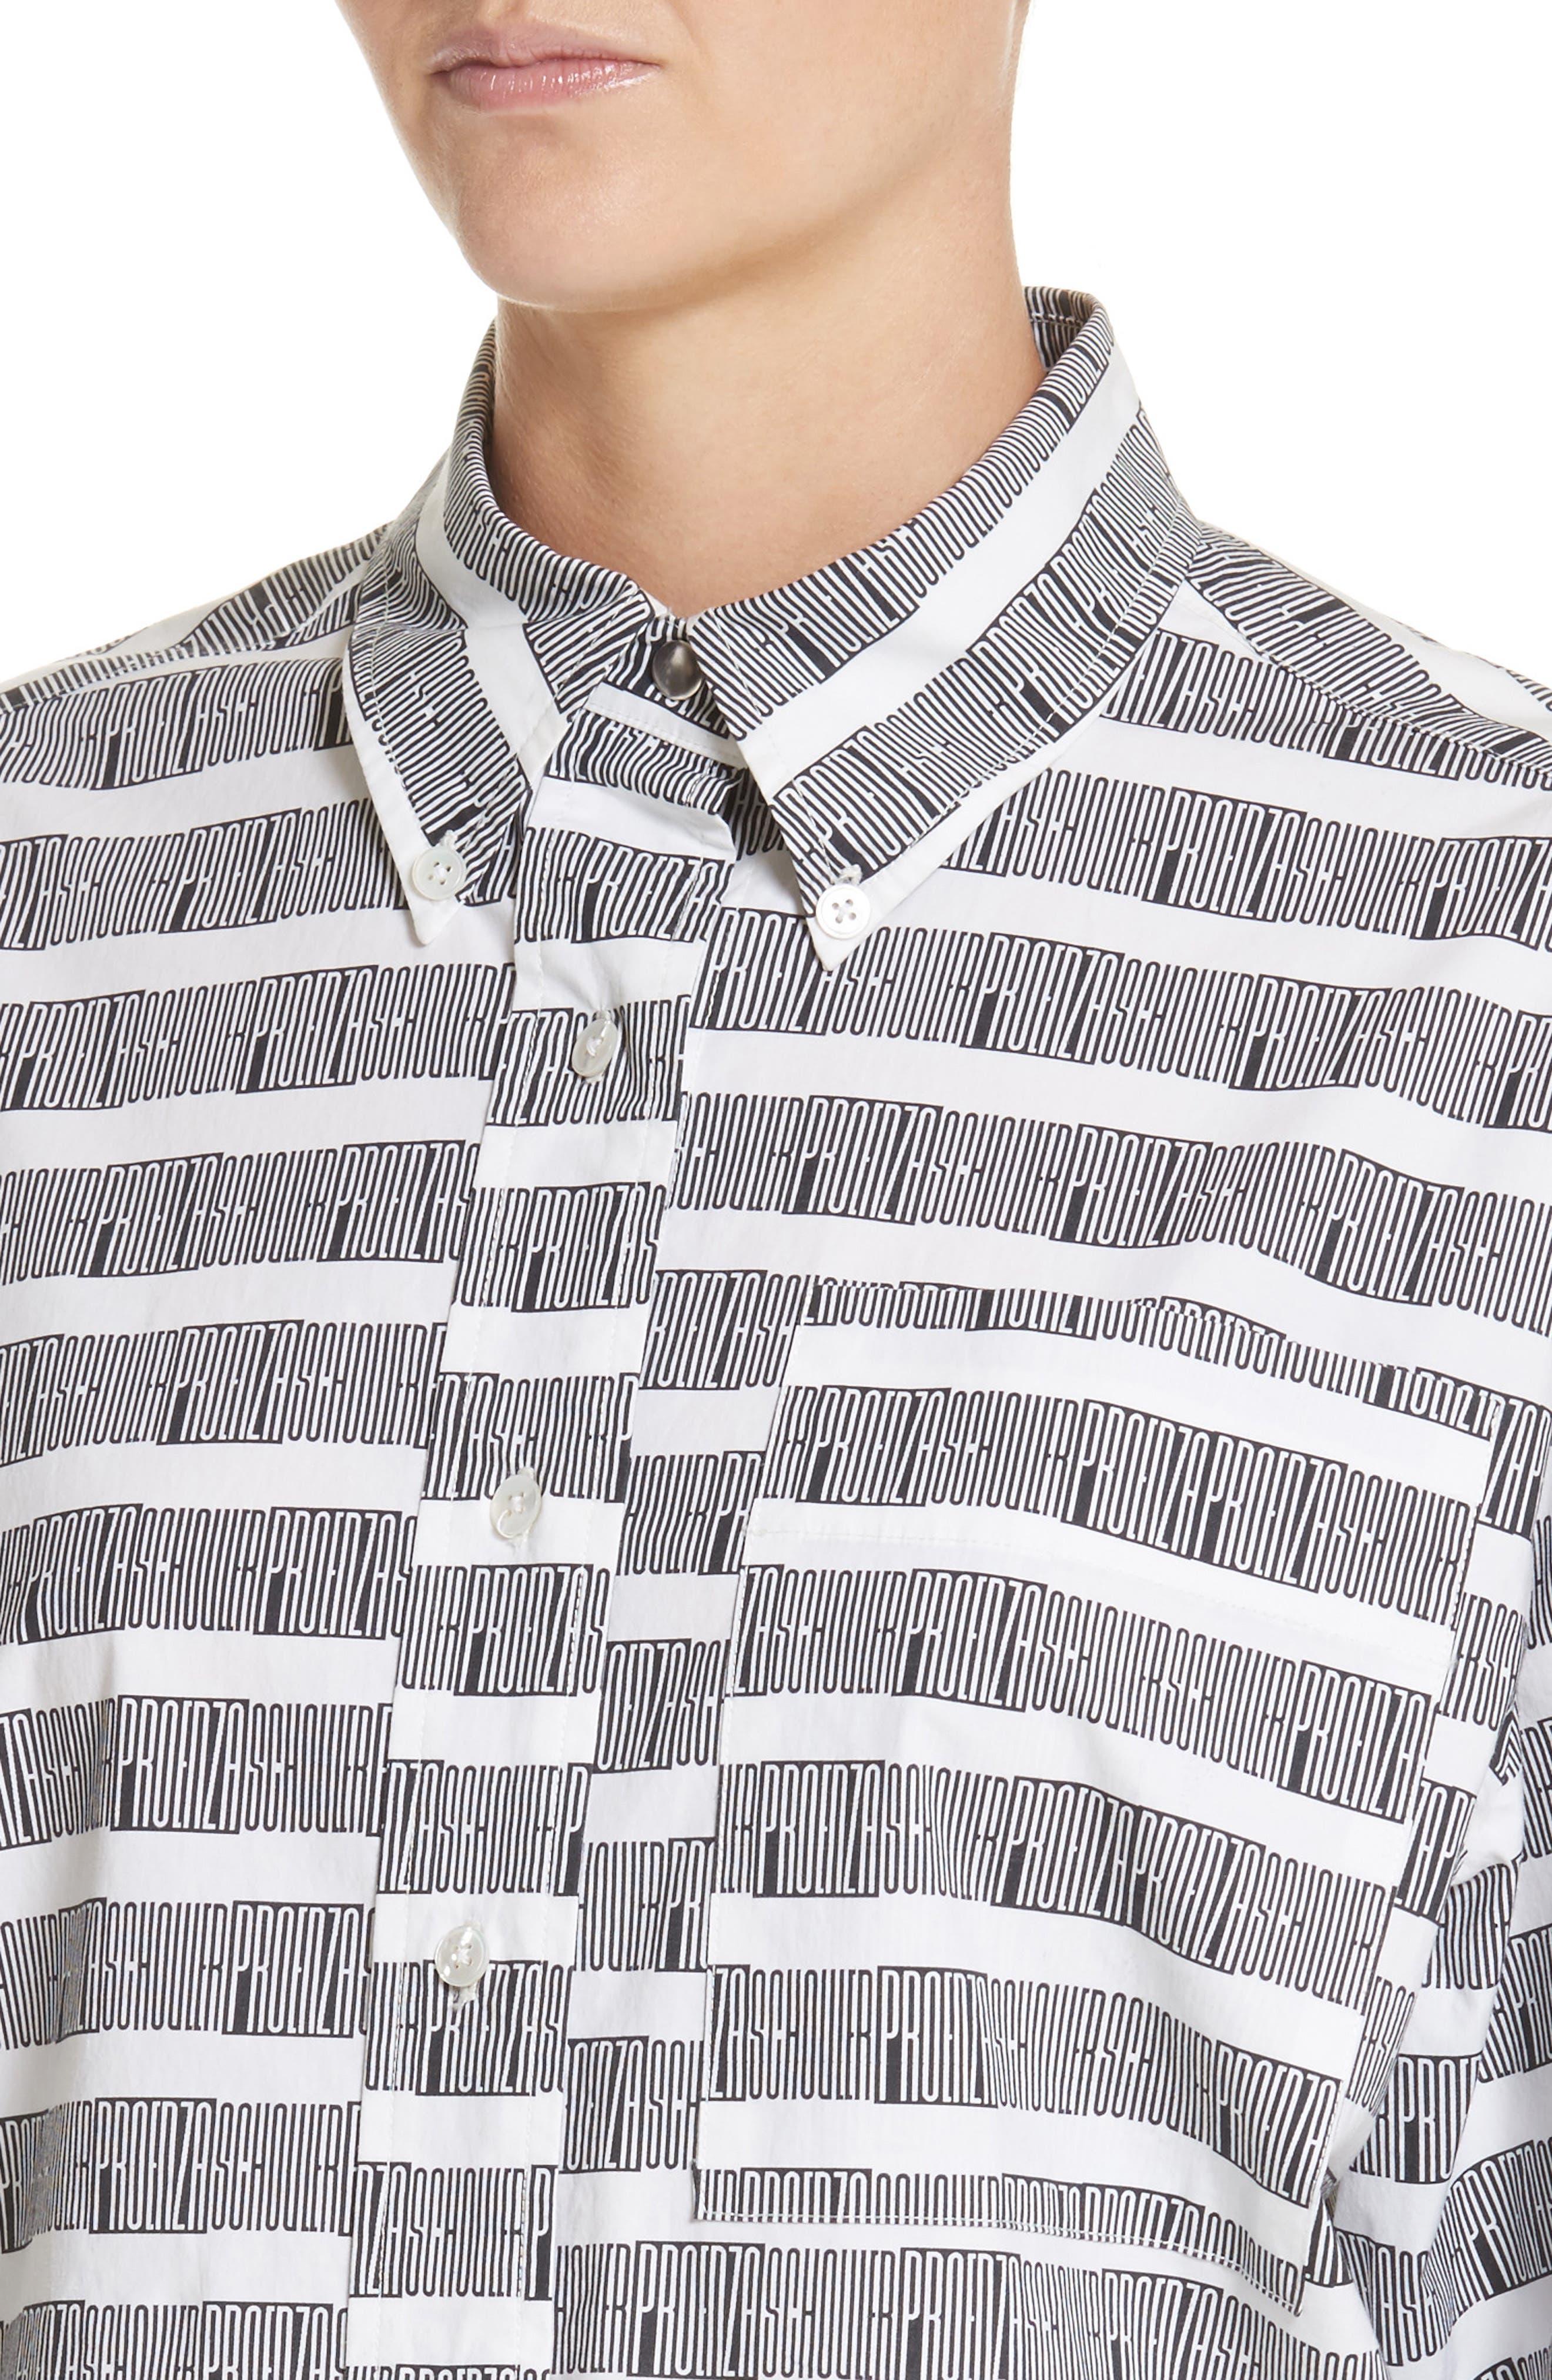 PSWL Graphic Stripe Cotton Top,                             Alternate thumbnail 4, color,                             001